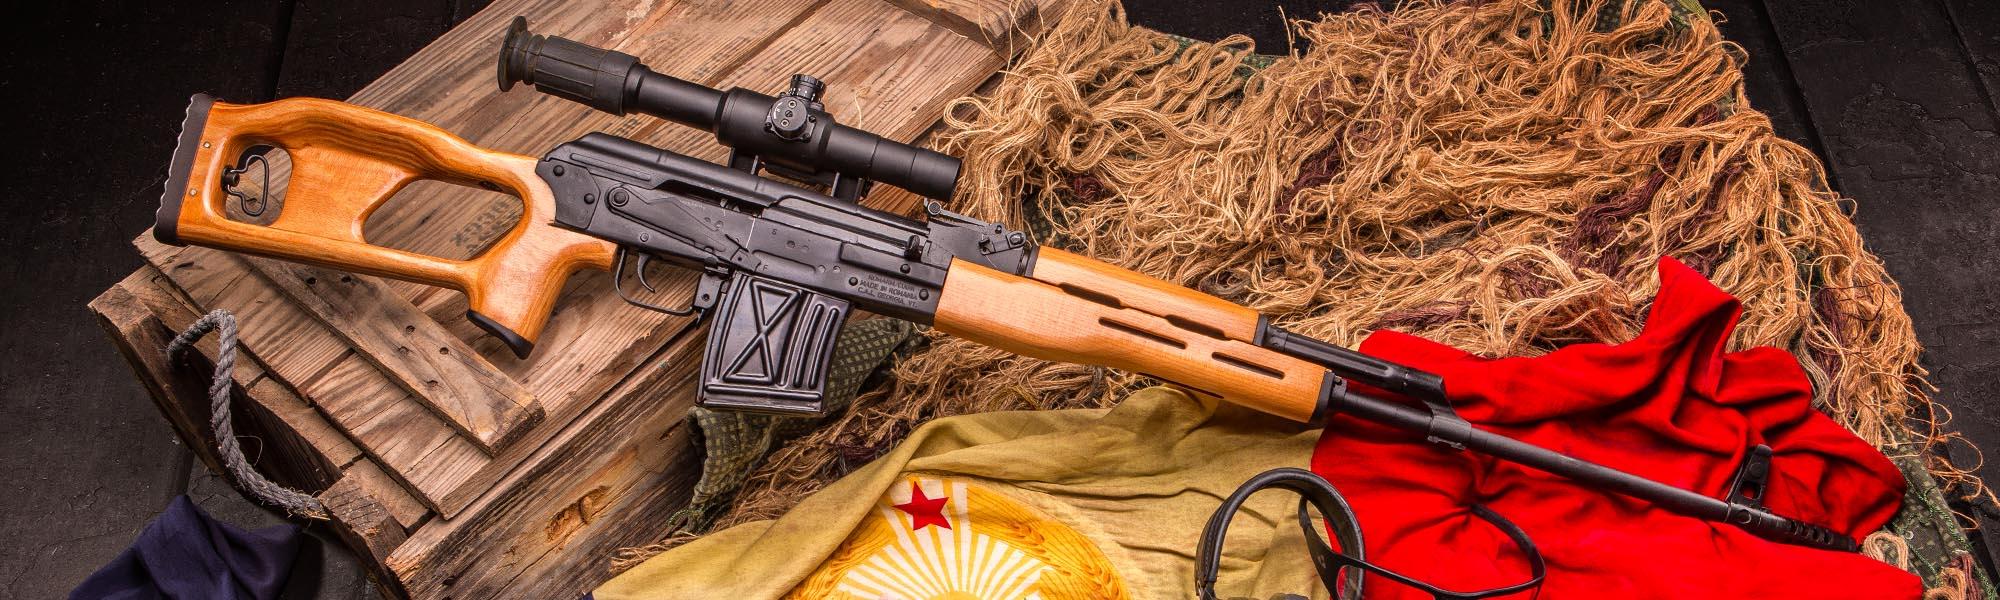 Century Arms PSL 54